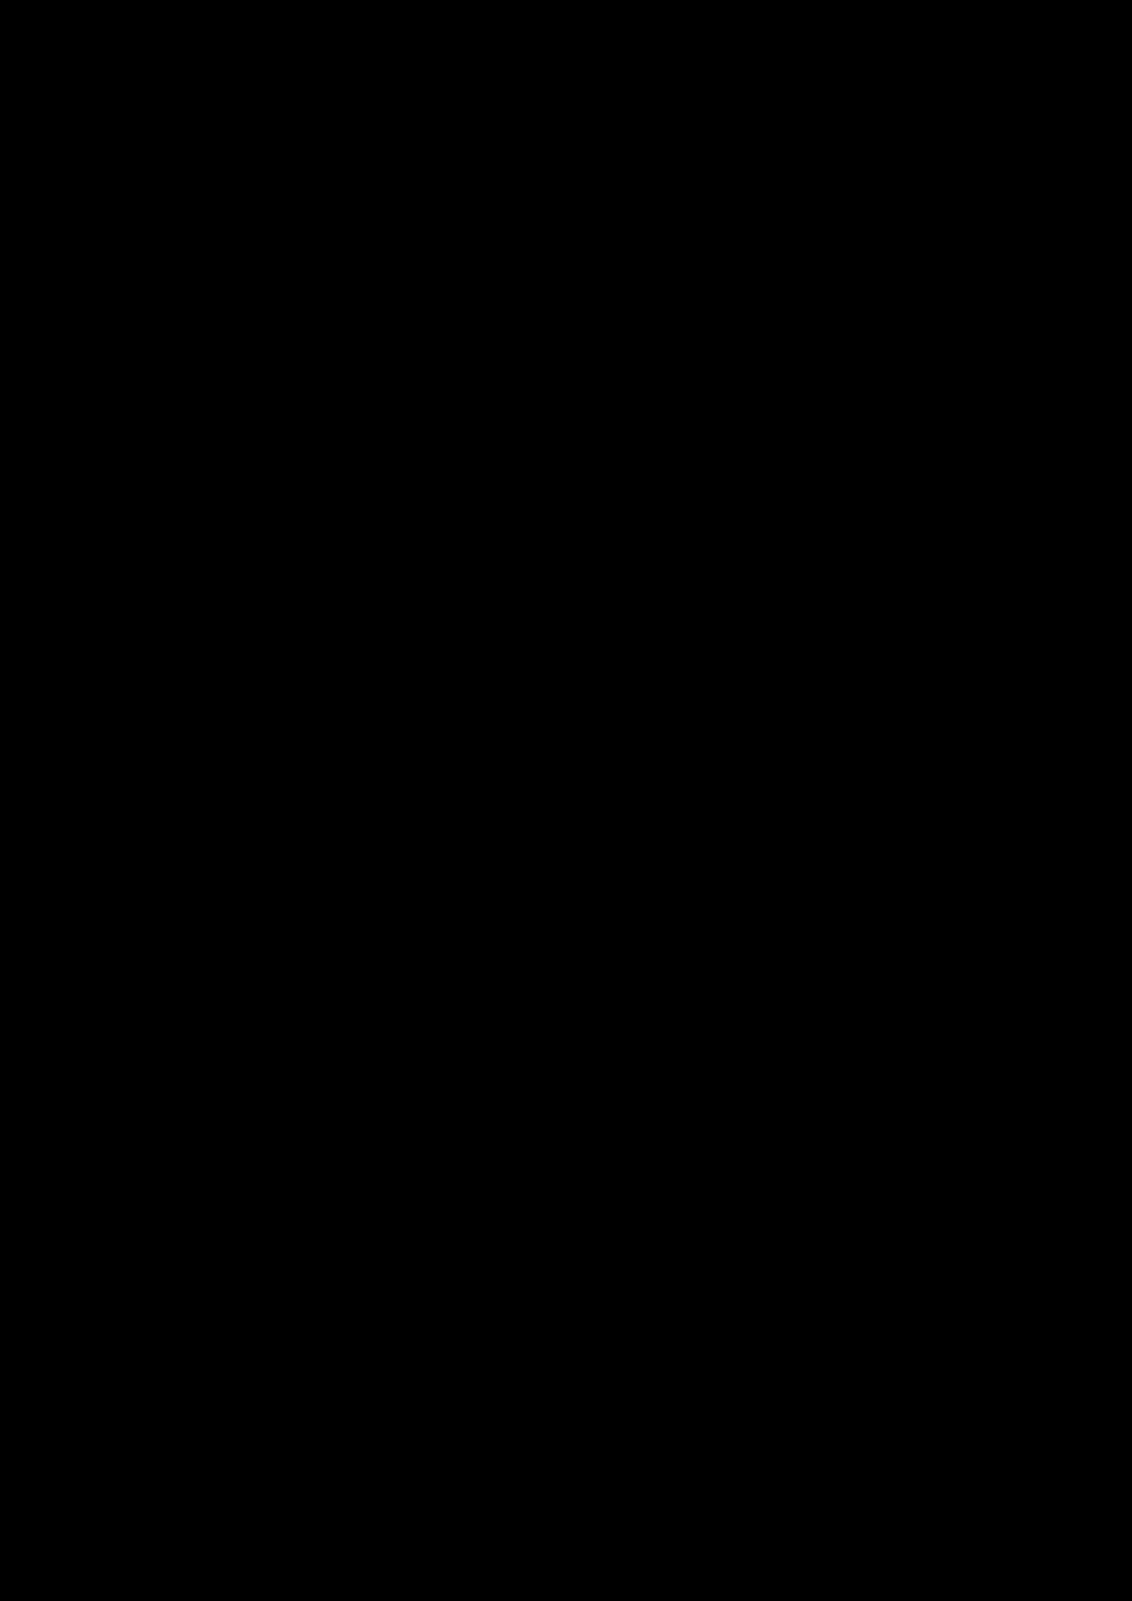 Belyiy sokol slide, Image 160